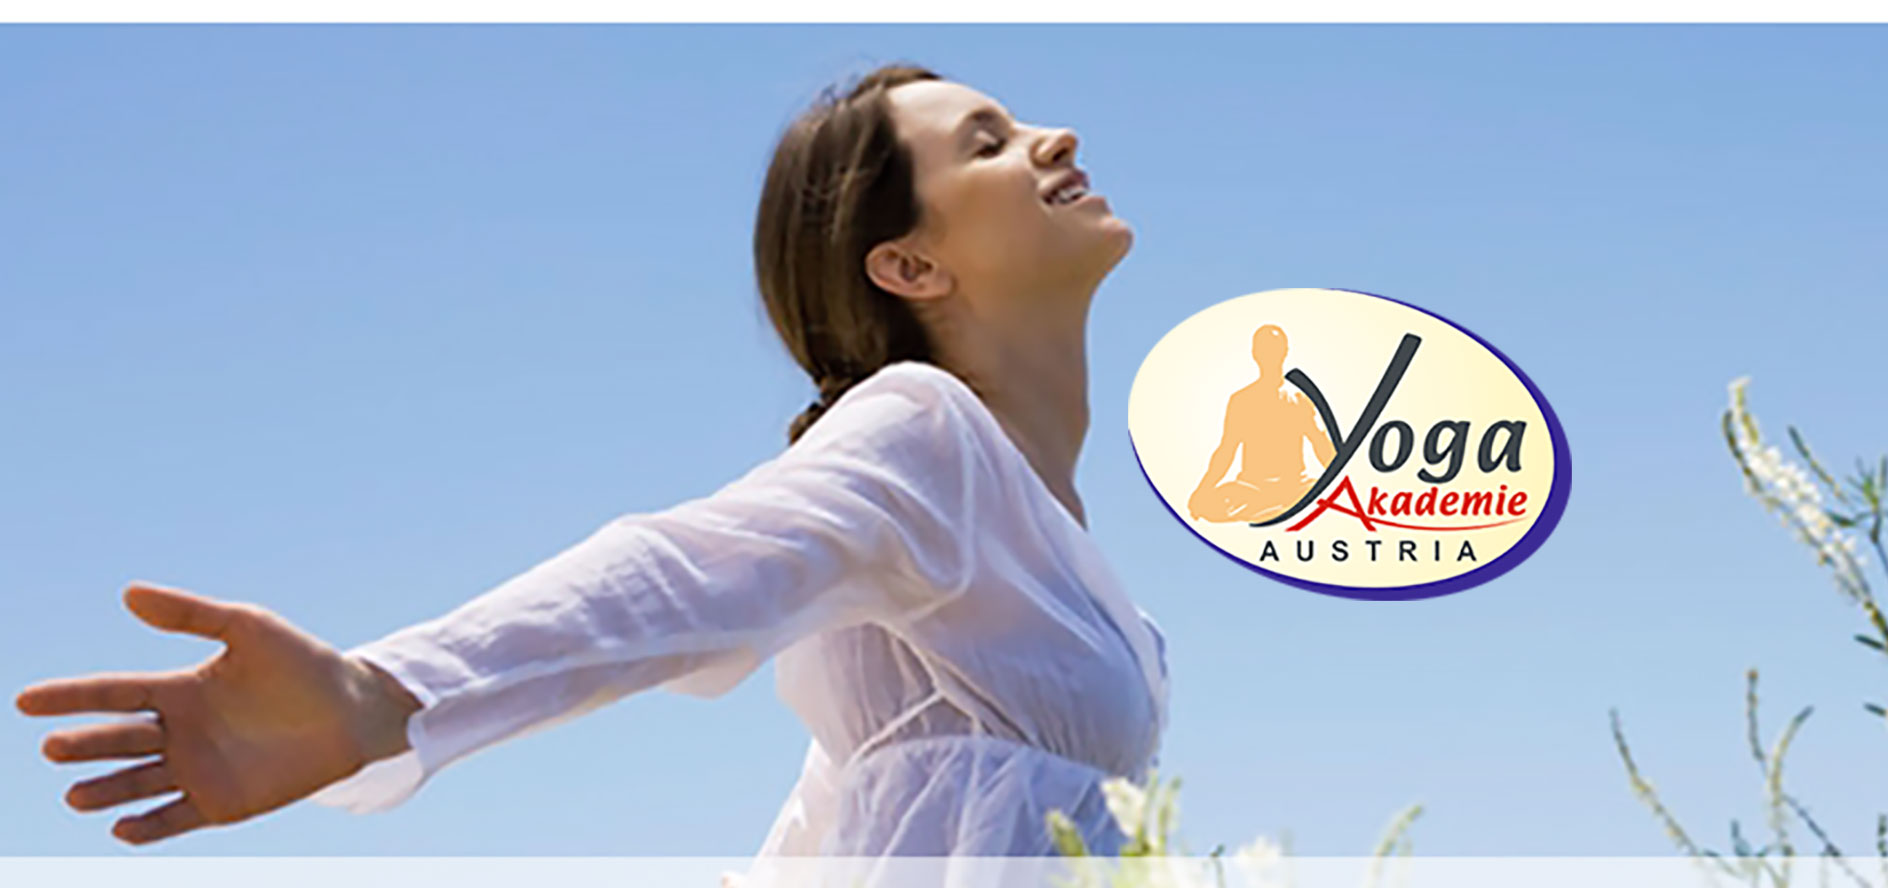 Yogaakademie Austria